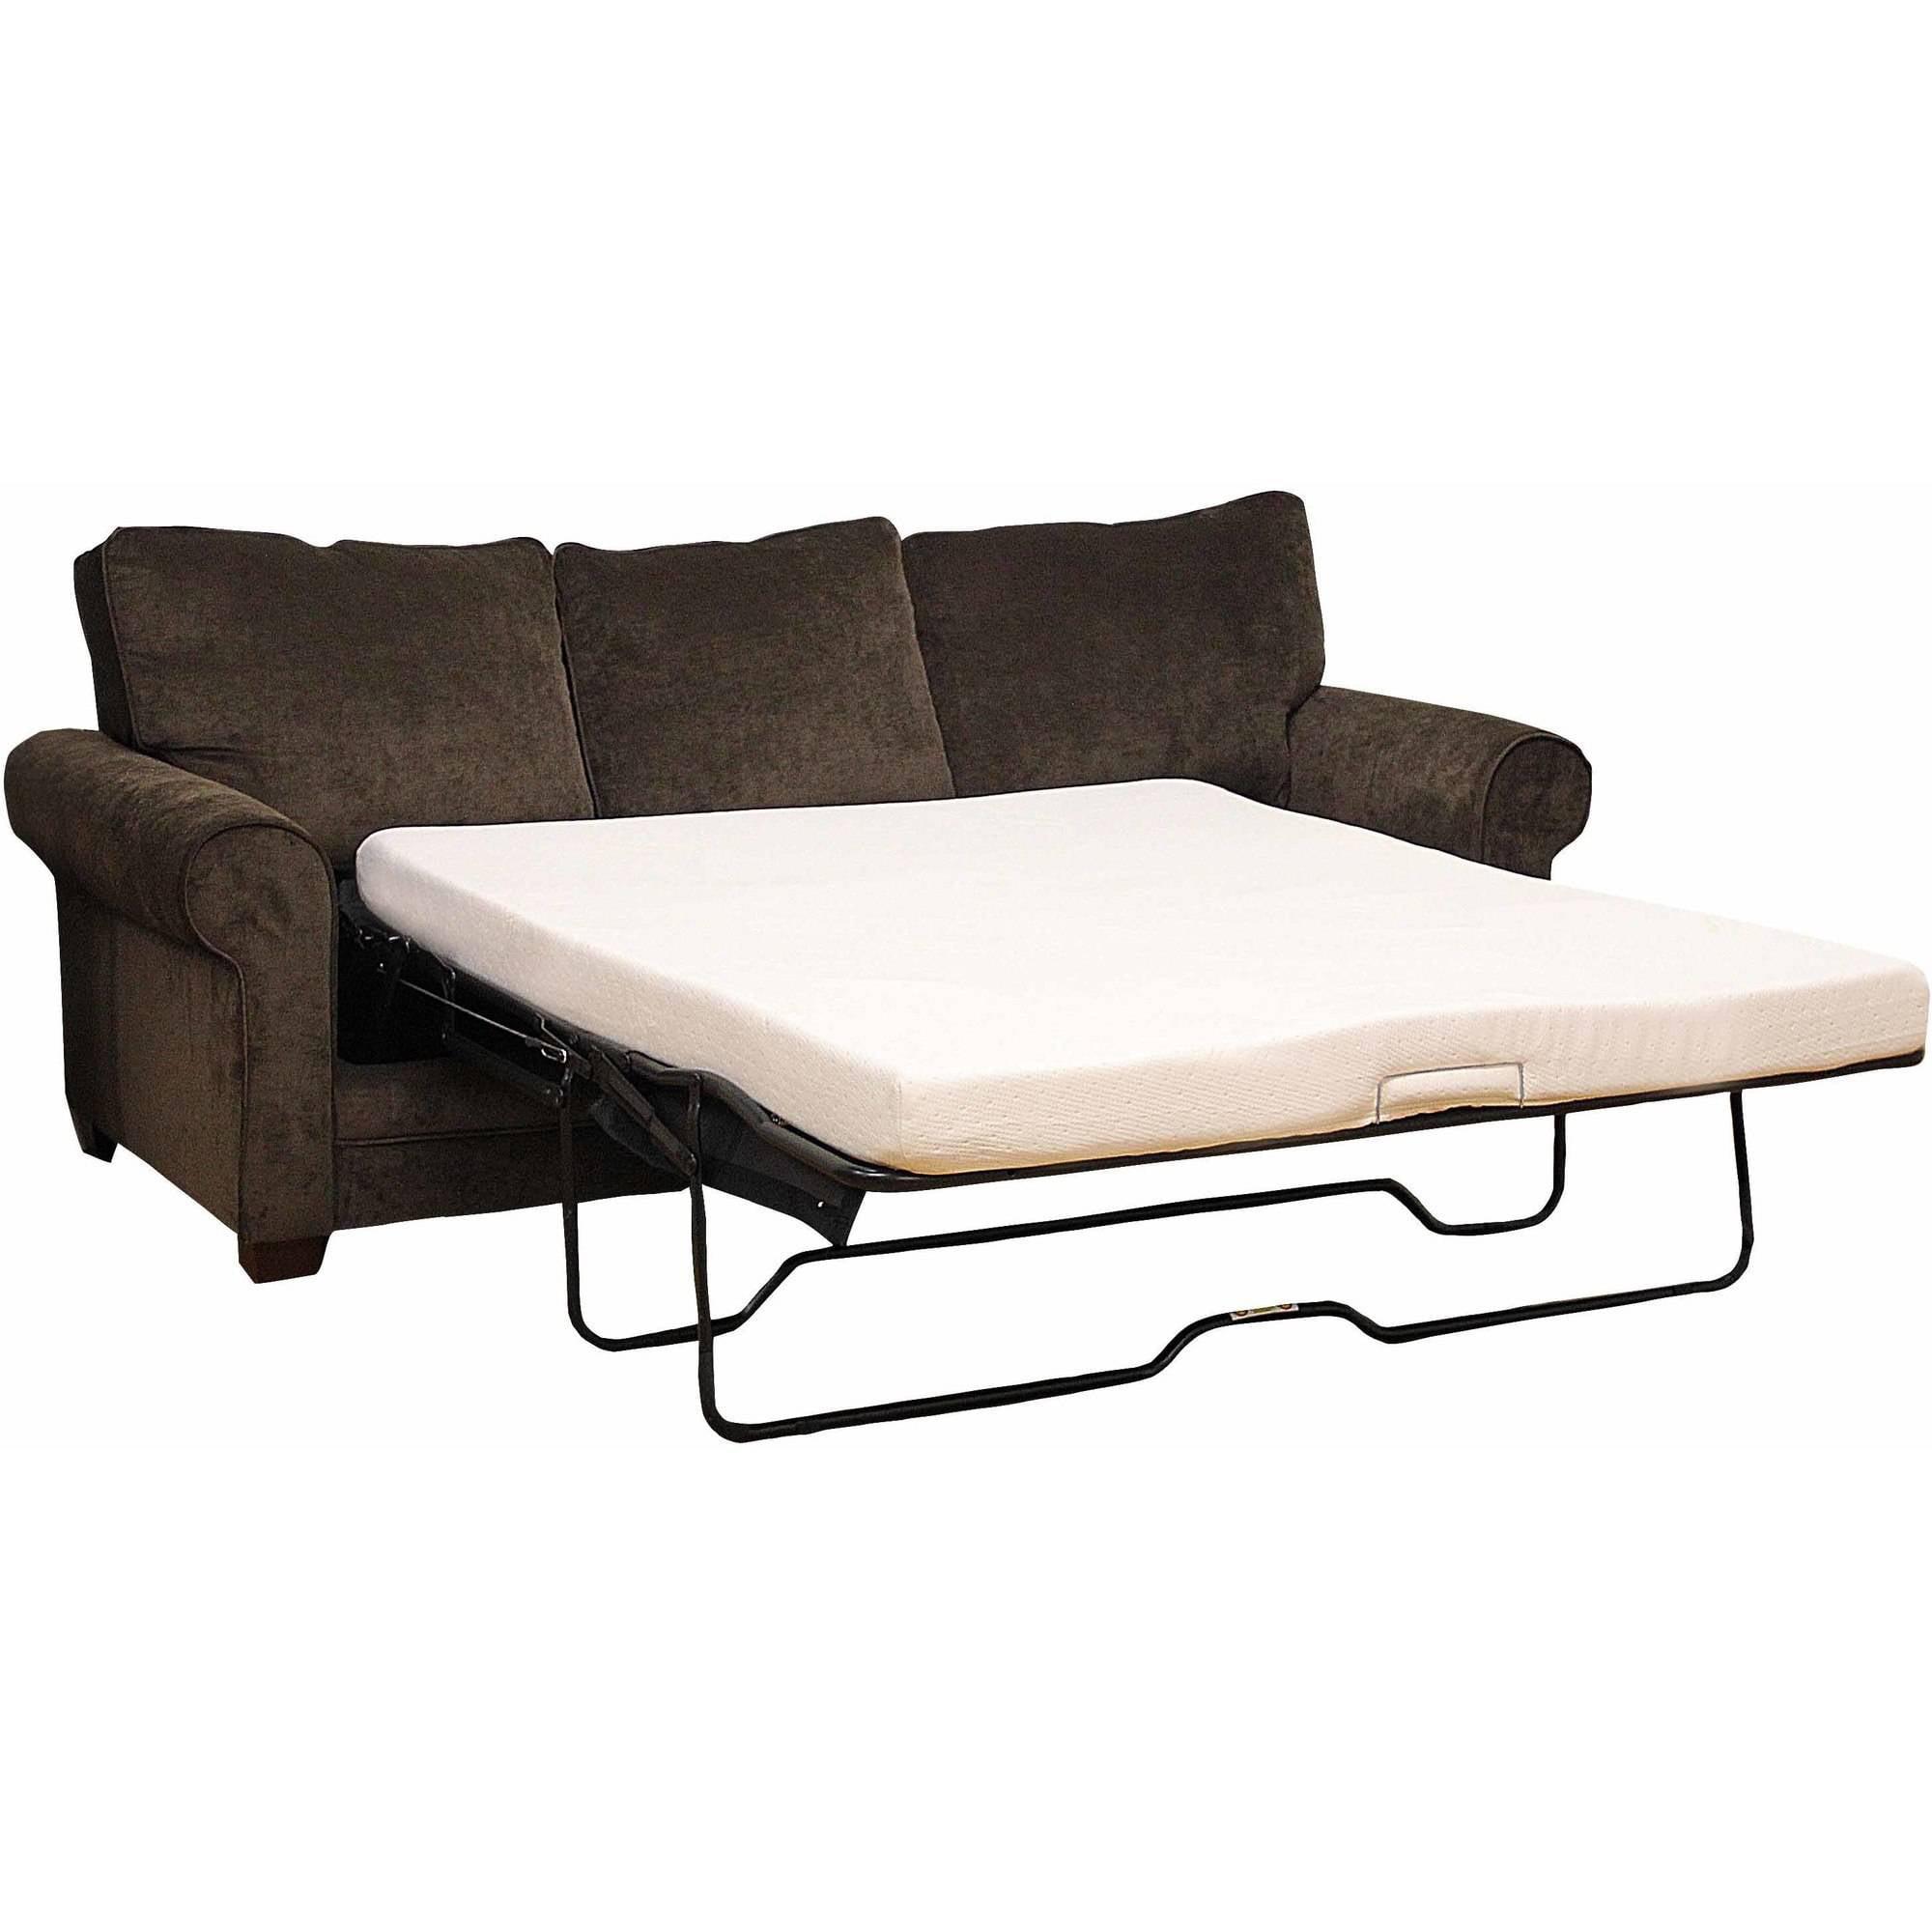 "Modern Sleep Memory Foam 4.5"" Sofa Bed Mattress, Multiple Sizes"